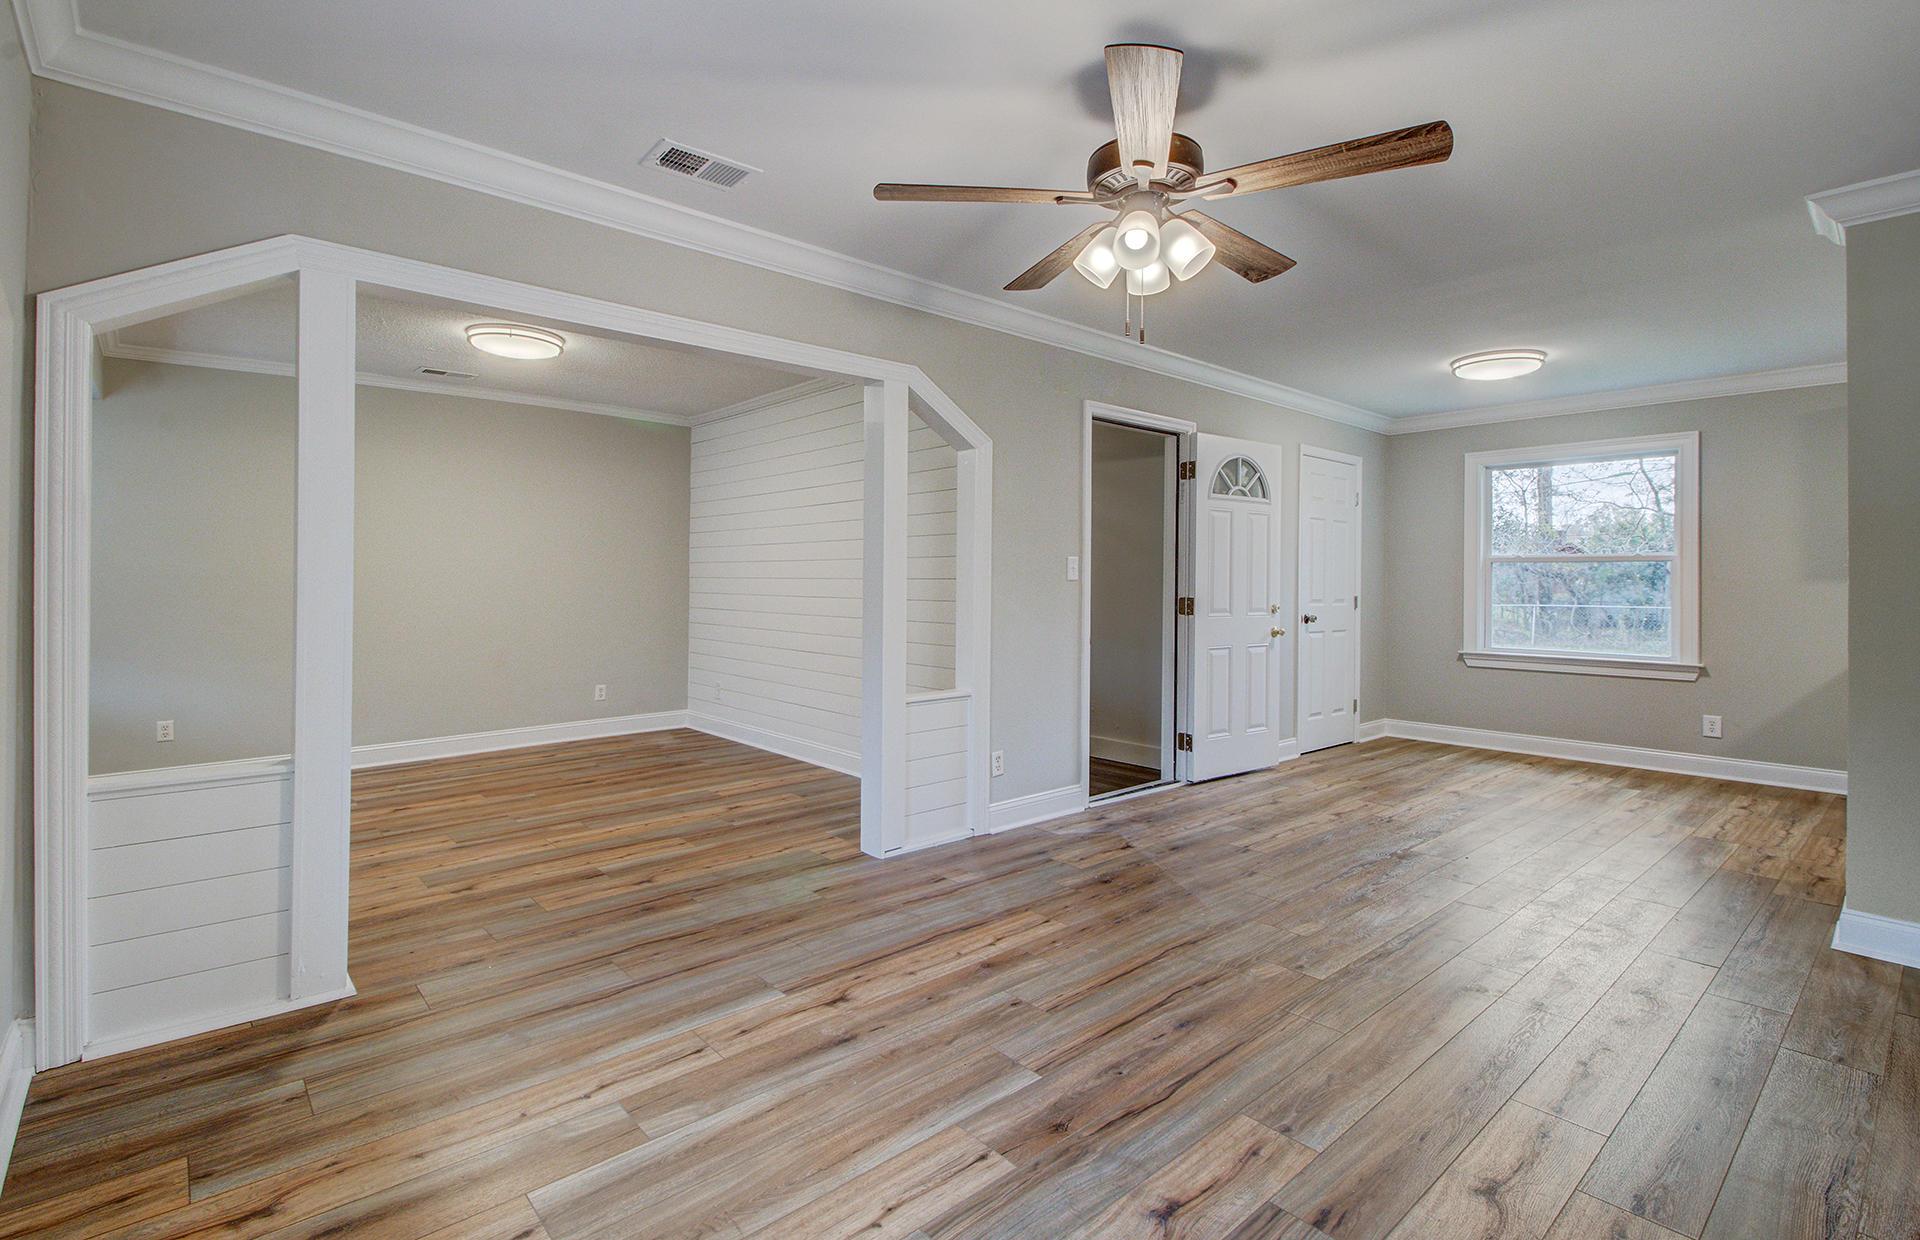 Sedgefield Section I Homes For Sale - 30 Aldene, Goose Creek, SC - 9